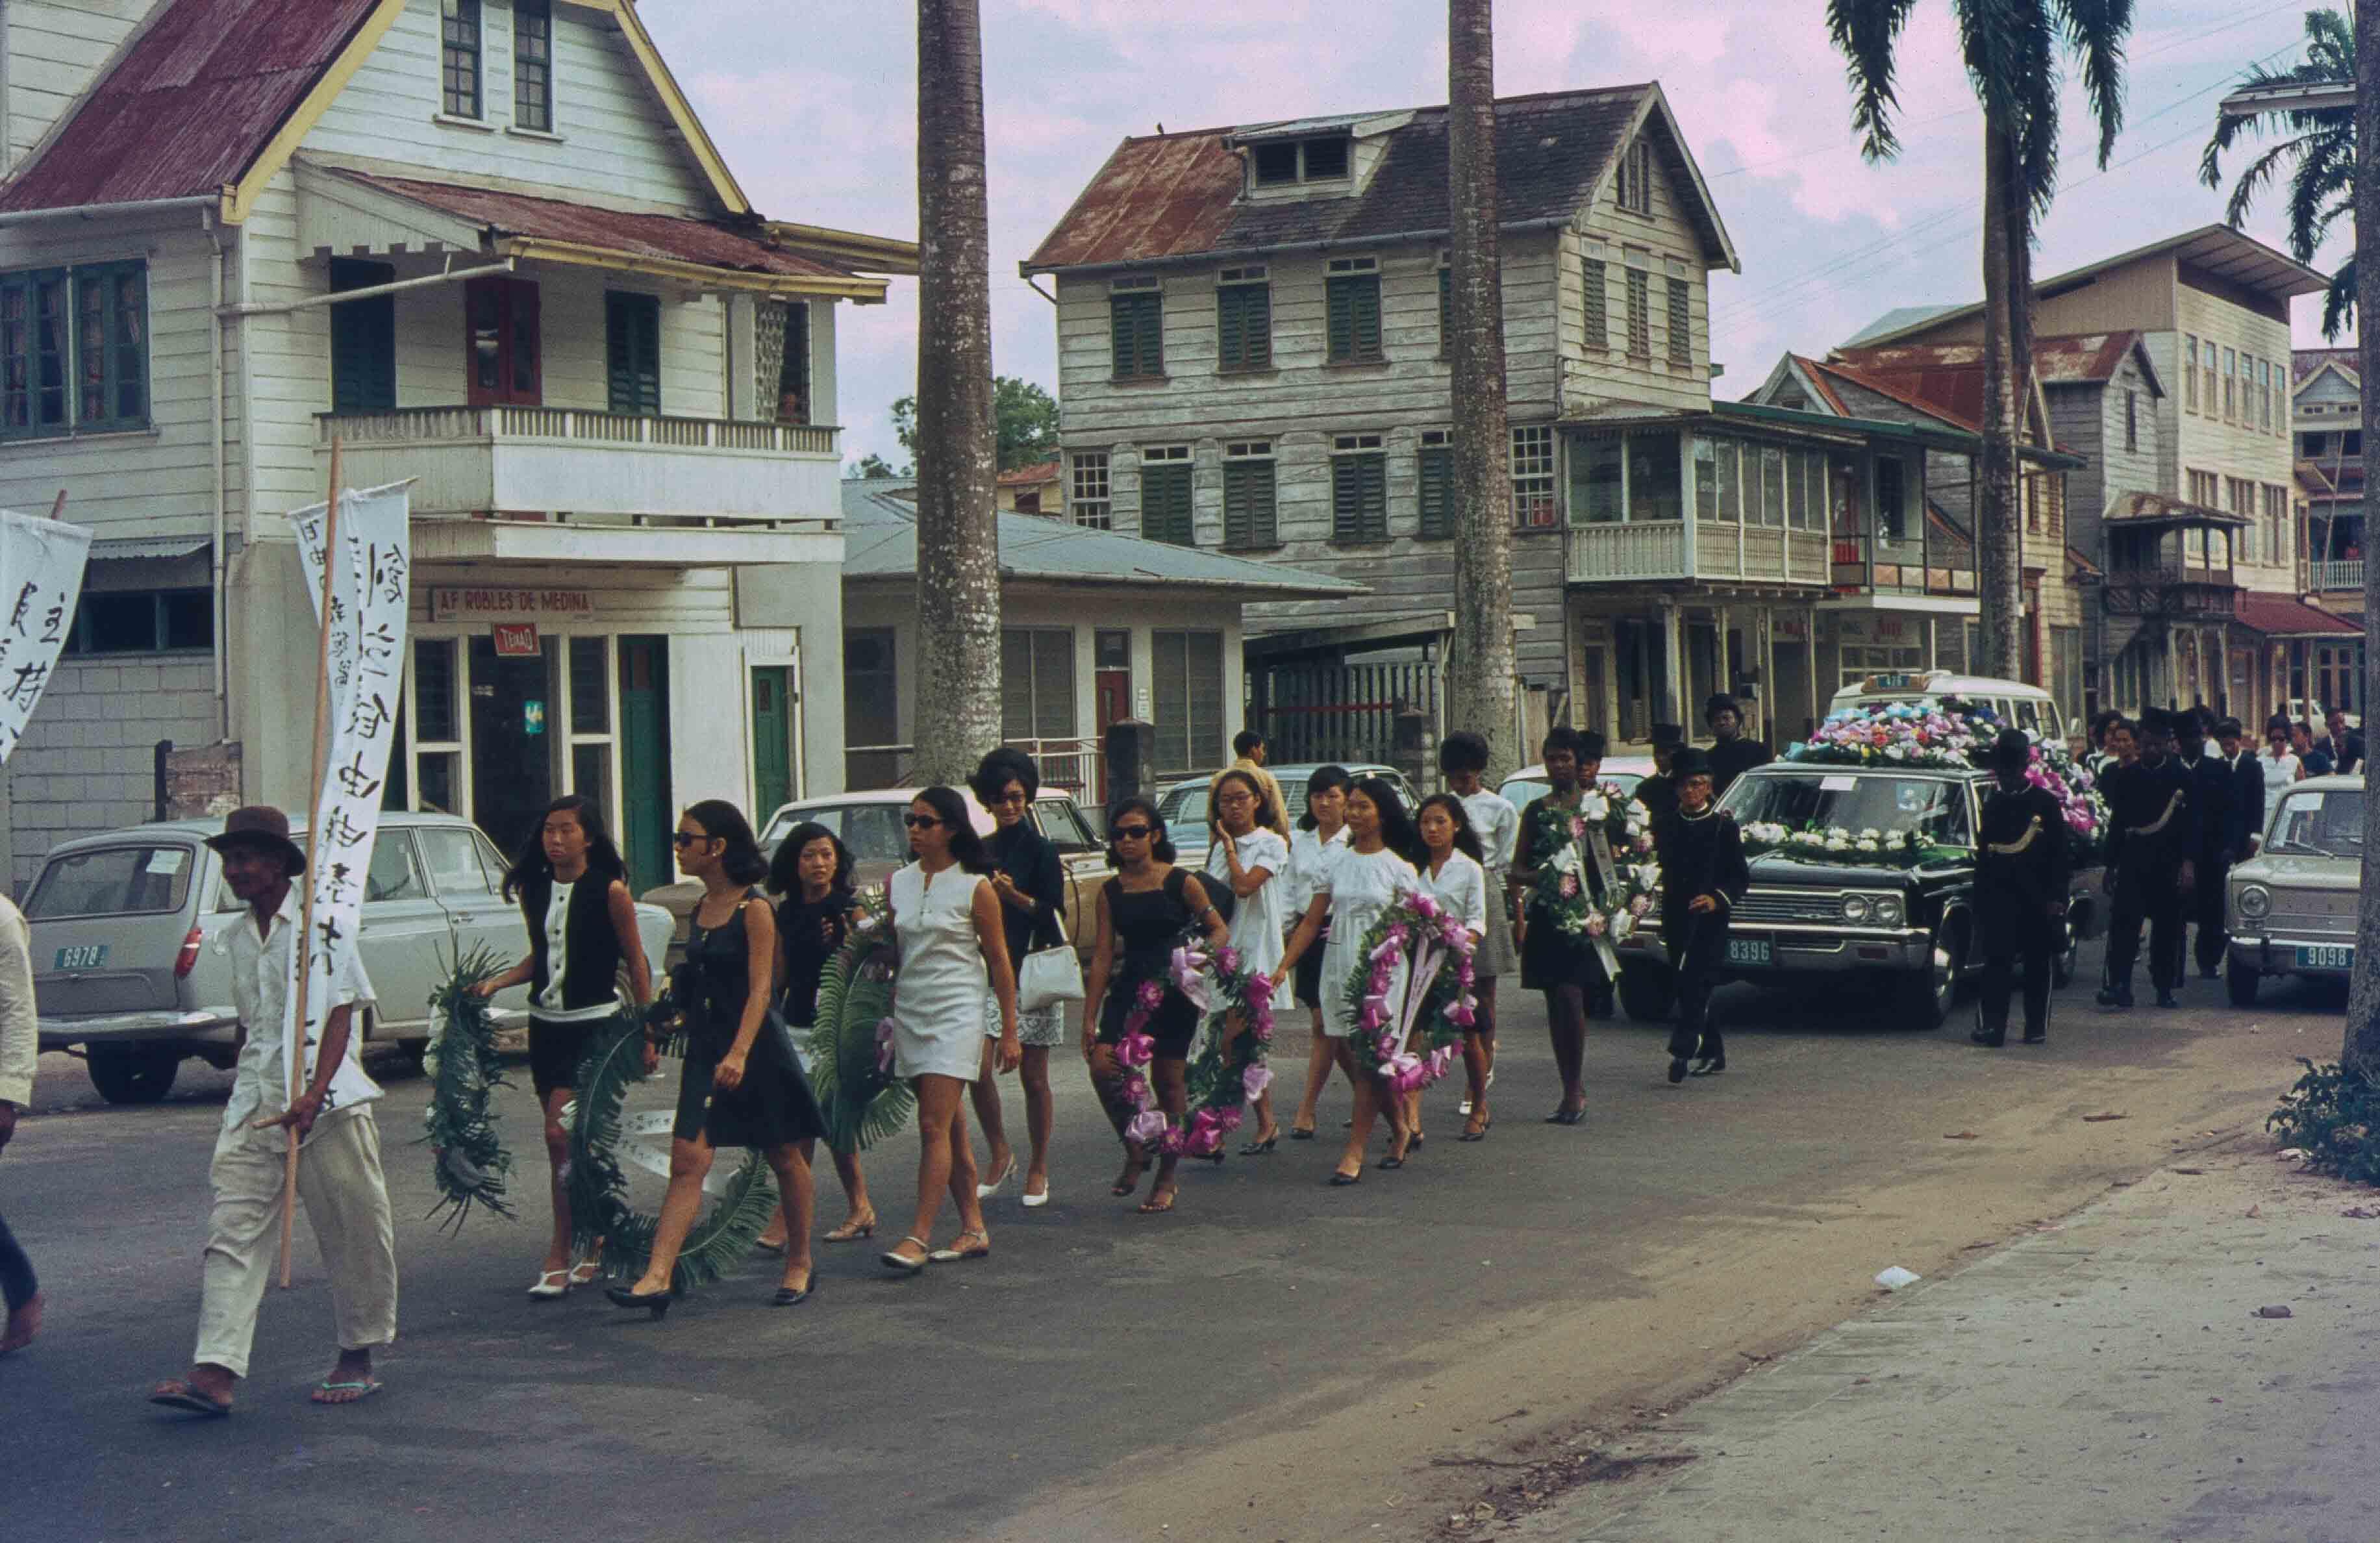 161. Suriname